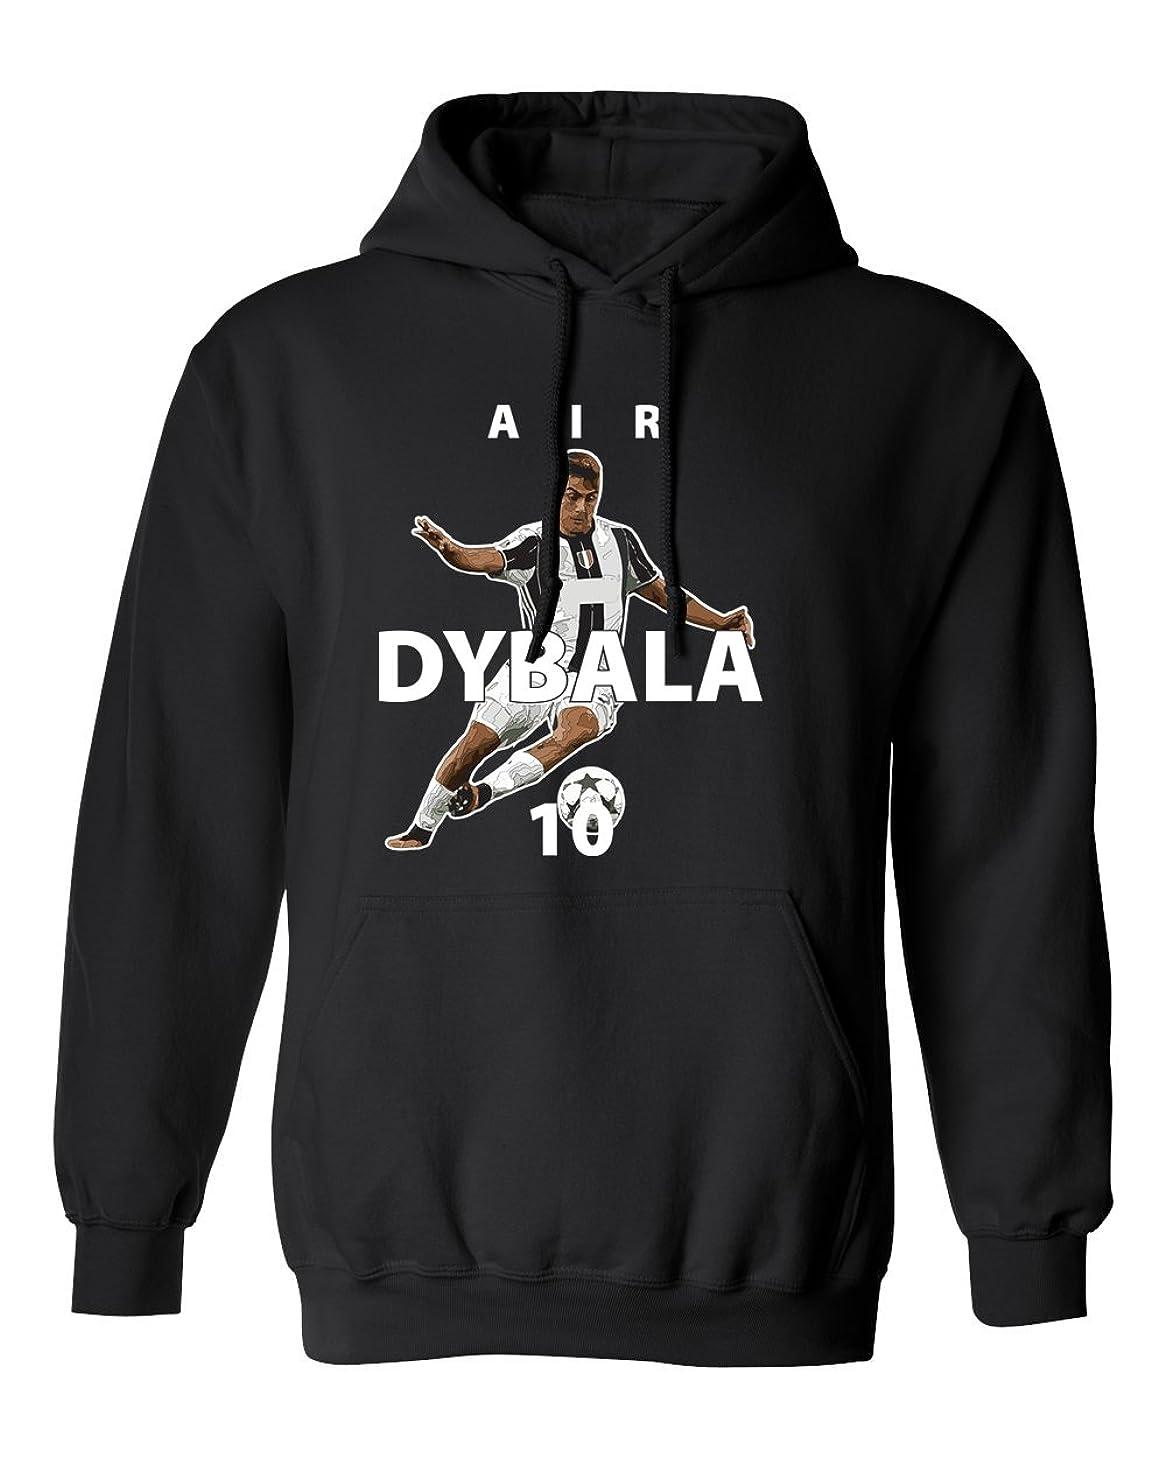 SMARTZONE Juventus Paulo Dybala Air Dybala Soccer Men's Hoodie Sweatshirt